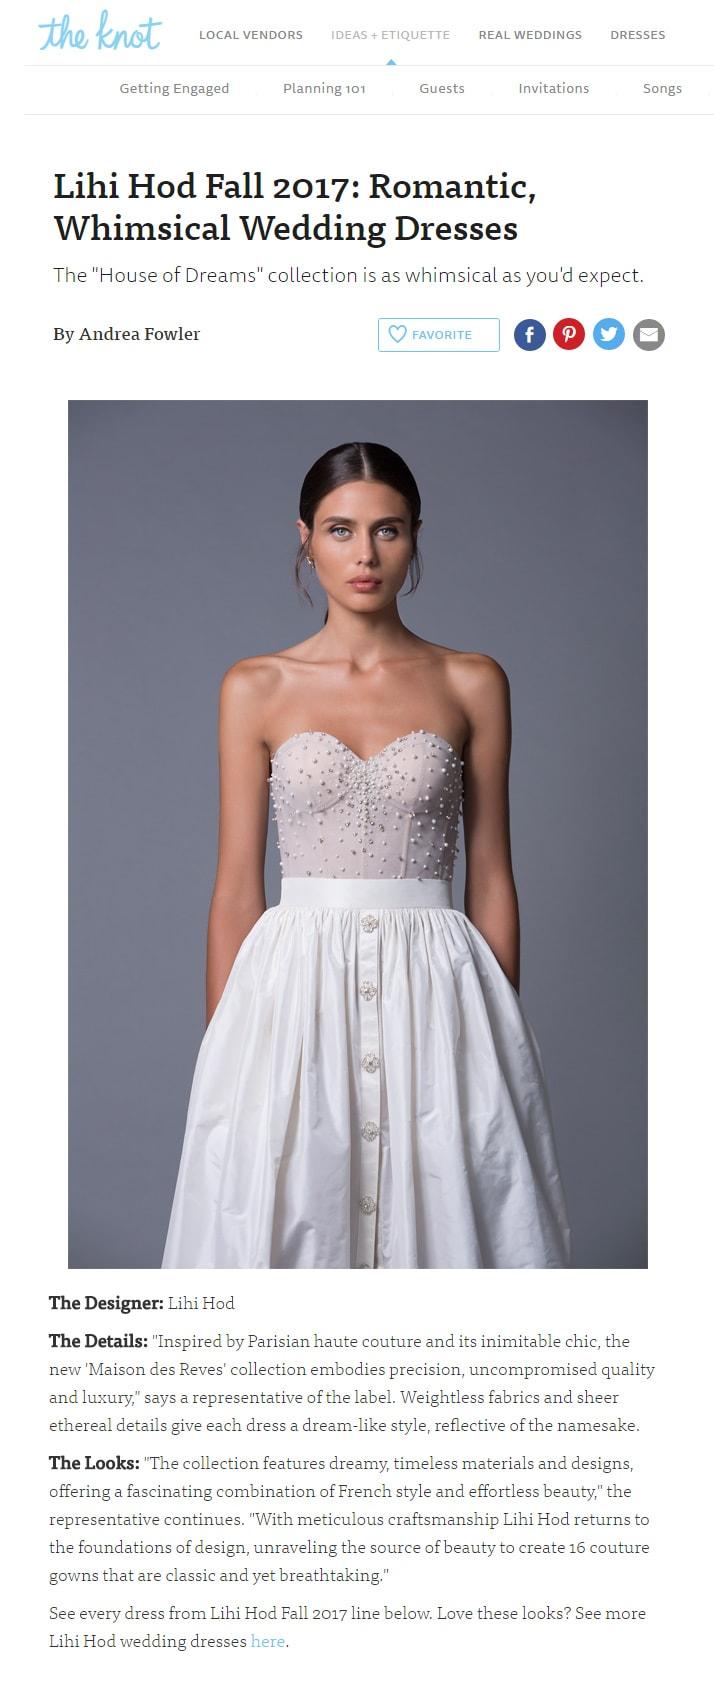 The Knot: Lihi Hod Fall 2017: Romantic,  Whimsical Wedding Dresses